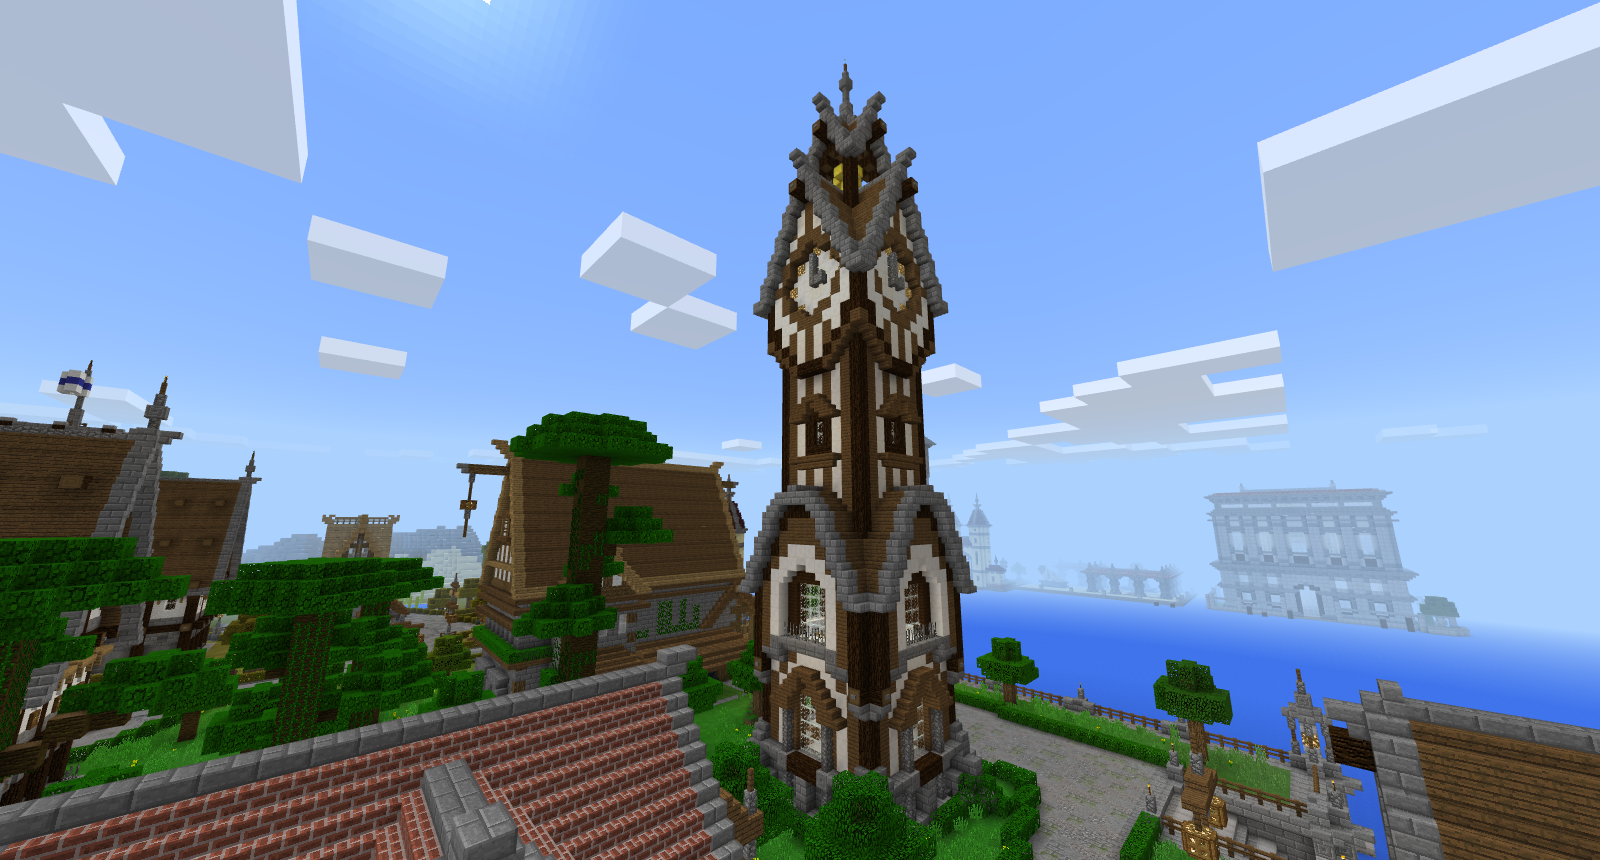 Minecraft Clock Tower  Minecraft clock, Minecraft, Minecraft